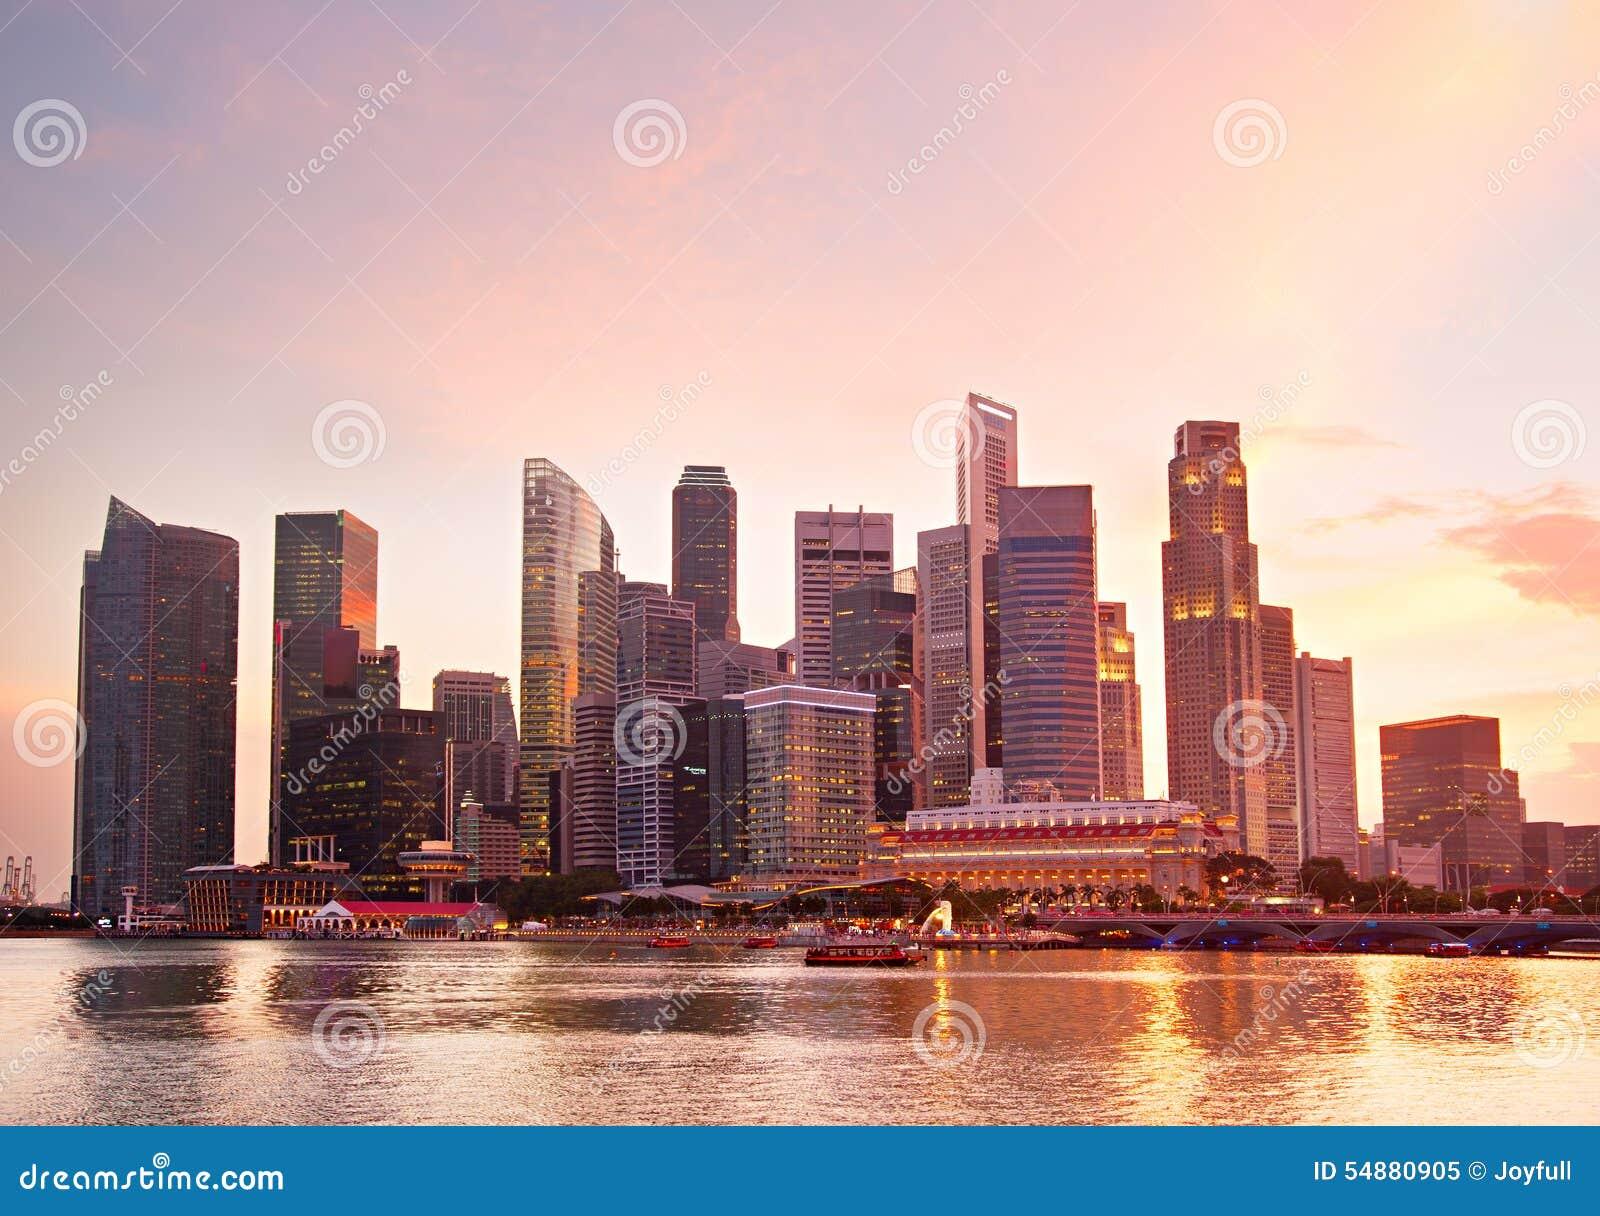 Singapore Real Estate Stock Photo Image 54880905